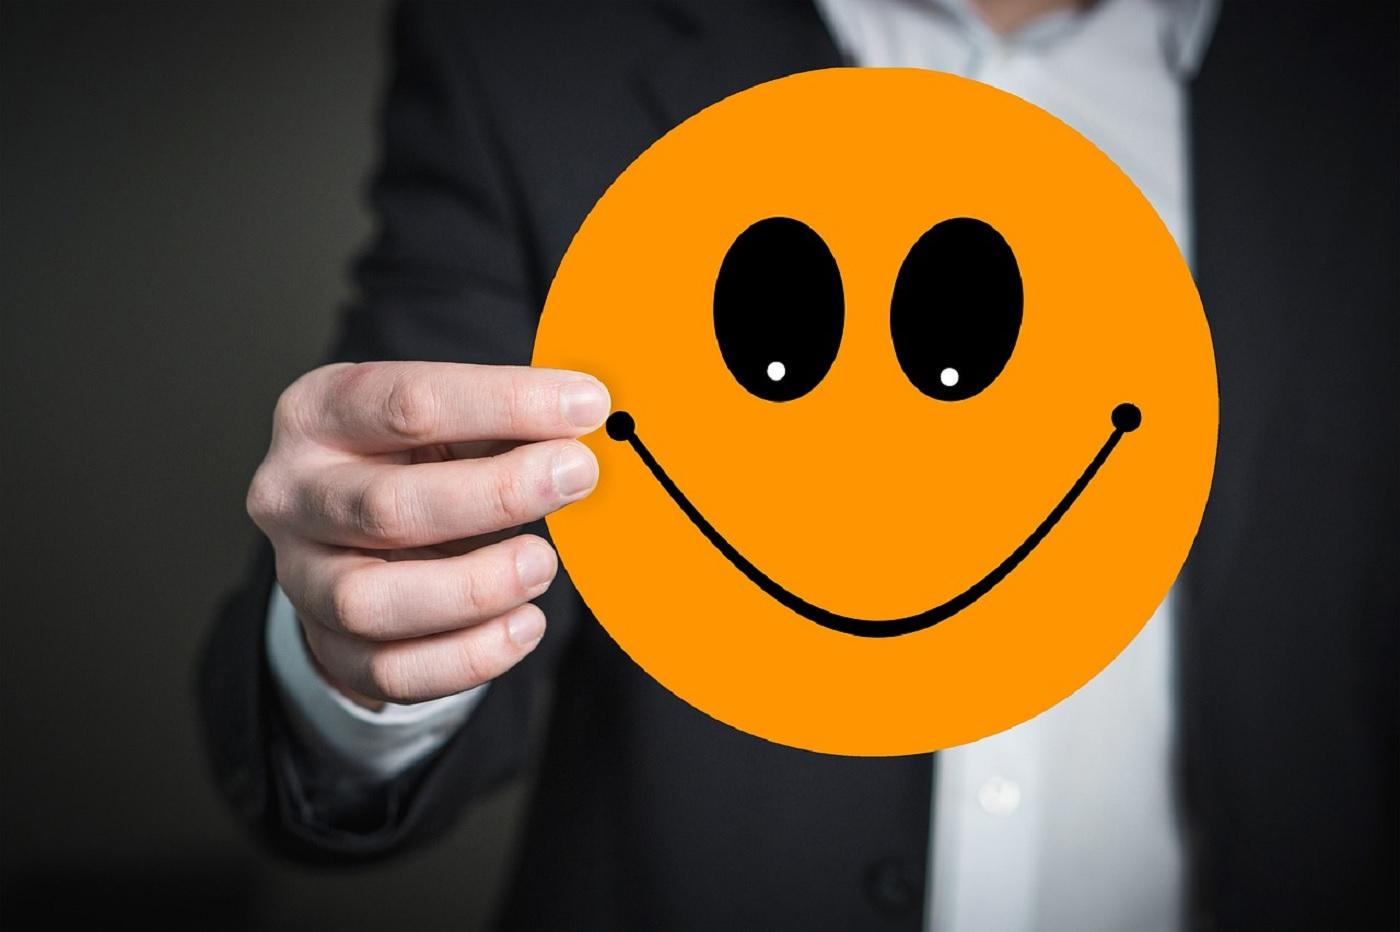 Emoji, smiley